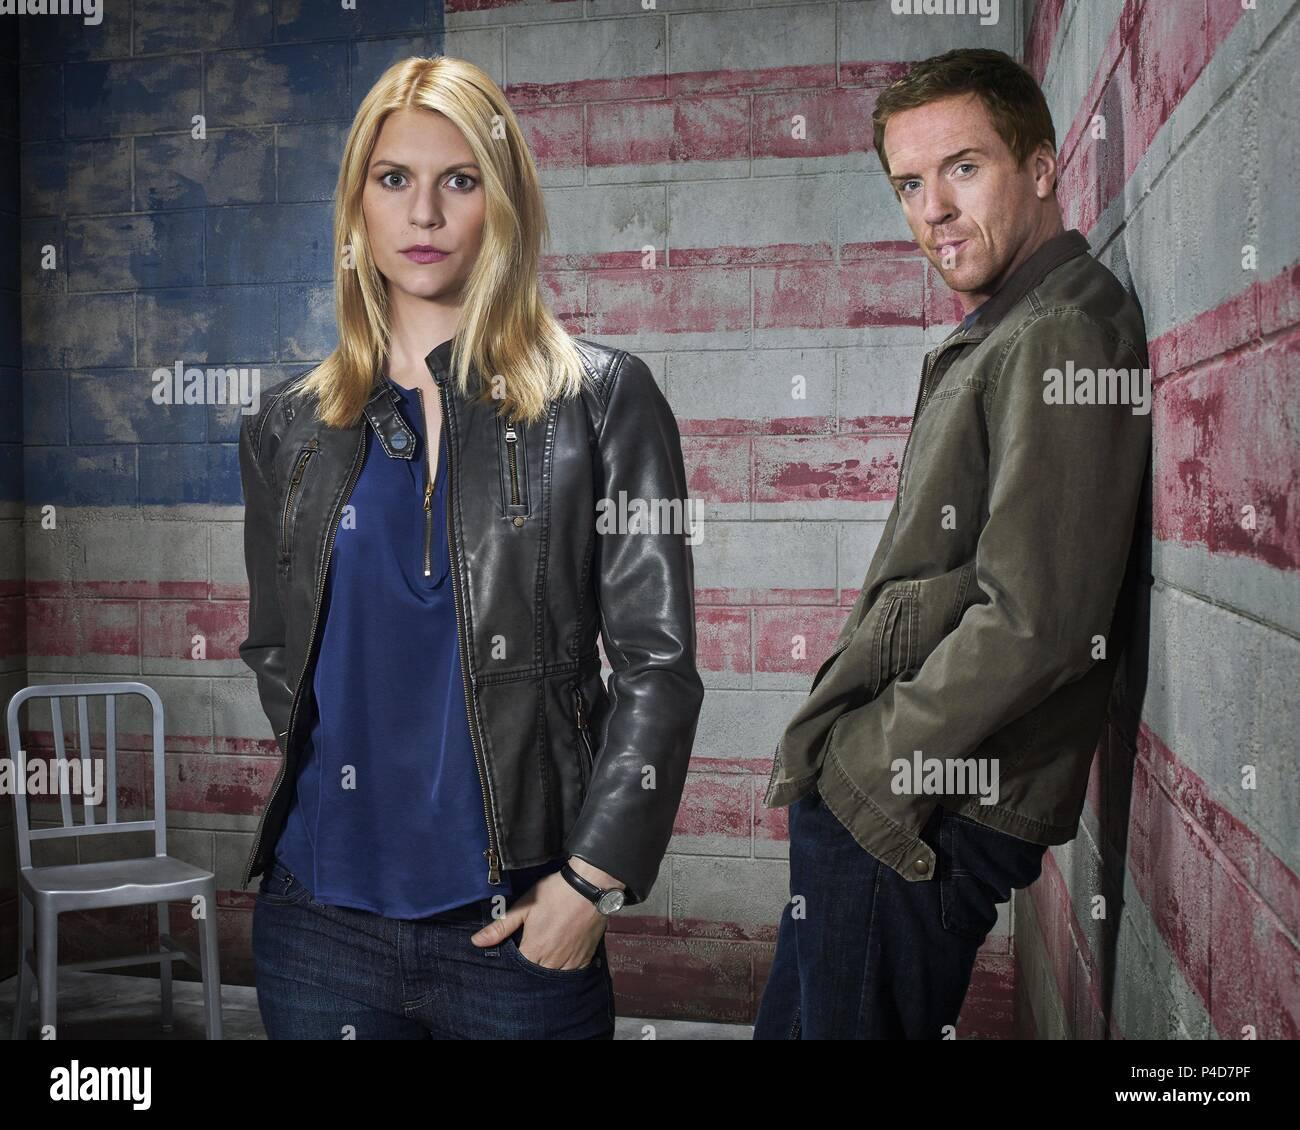 Description: Season 3.  Original Film Title: HOMELAND.  English Title: HOMELAND.  Year: 2011.  Stars: CLAIRE DANES; DAMIAN LEWIS. Credit: FOX 21 / Album - Stock Image